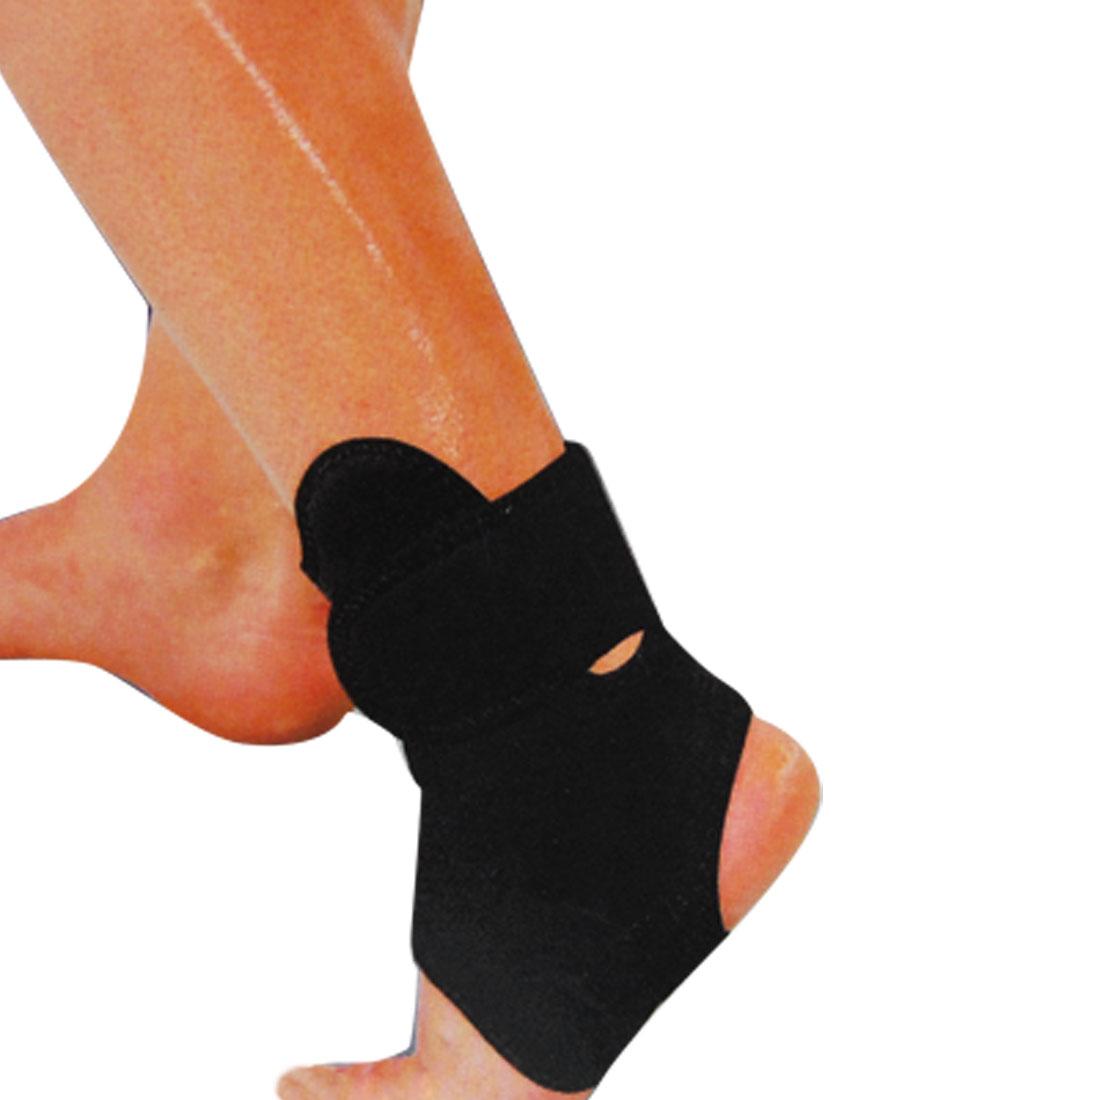 Elastic Black Neoprene Angle Support Protector Brace